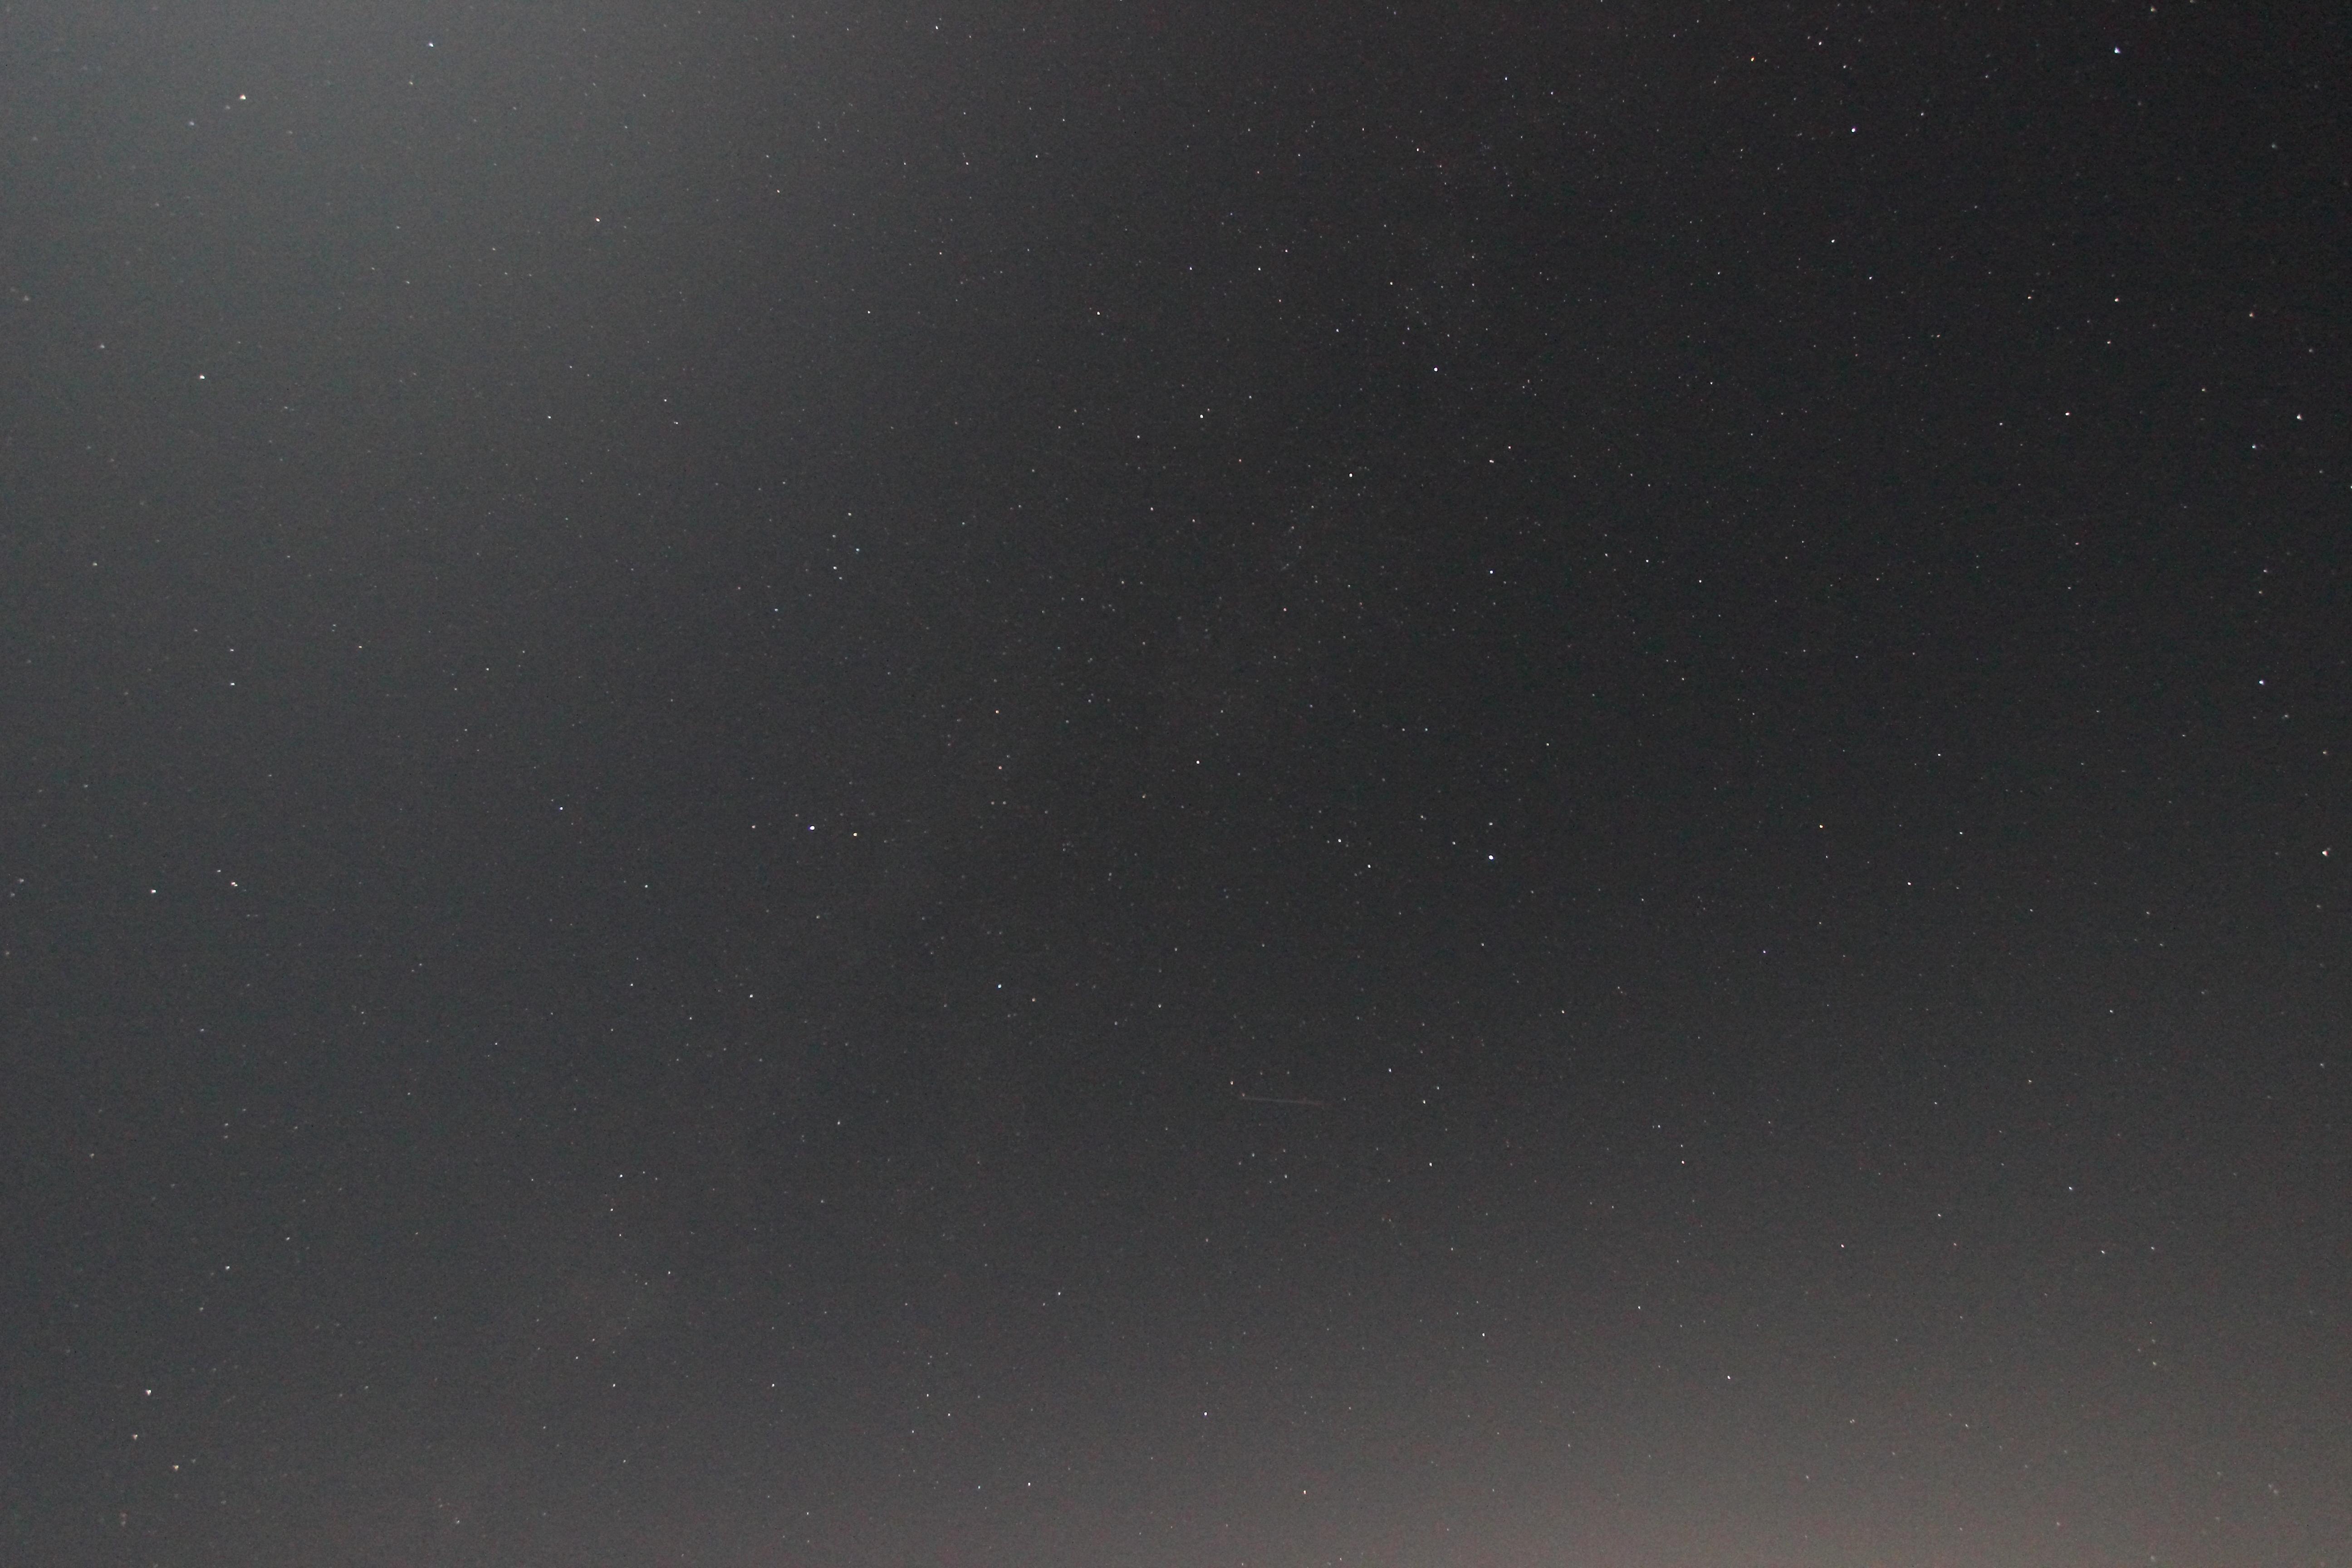 <b>画面左上は月、画面右下は夜景の灯りによる影響で、ムラになってしまった。</b>